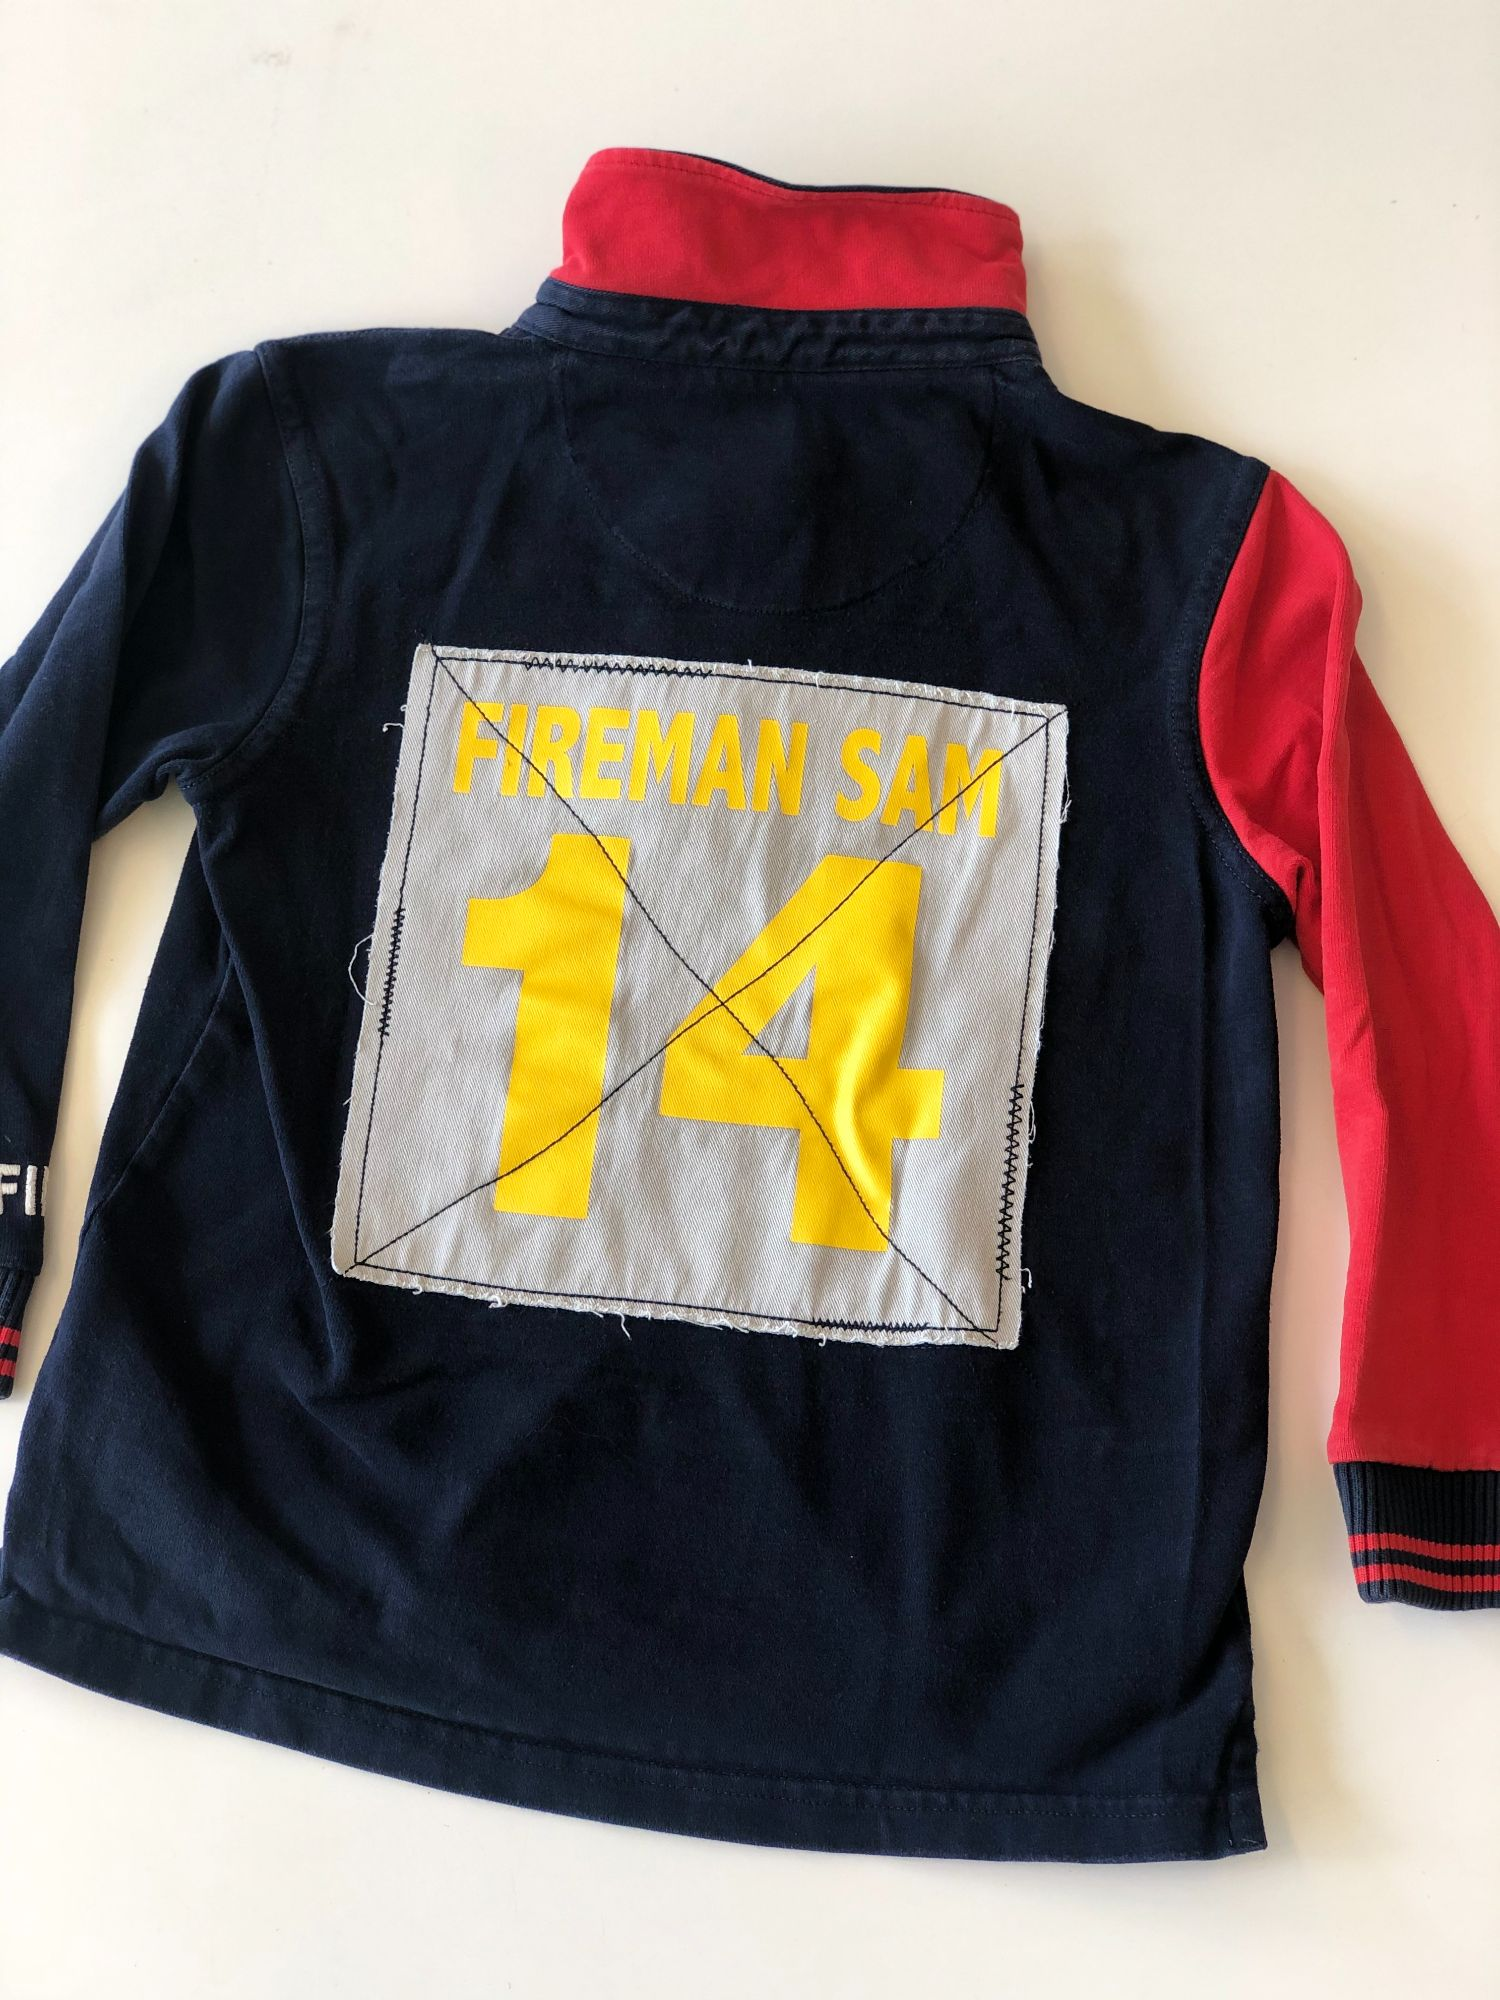 Brandweerman Sam shirt